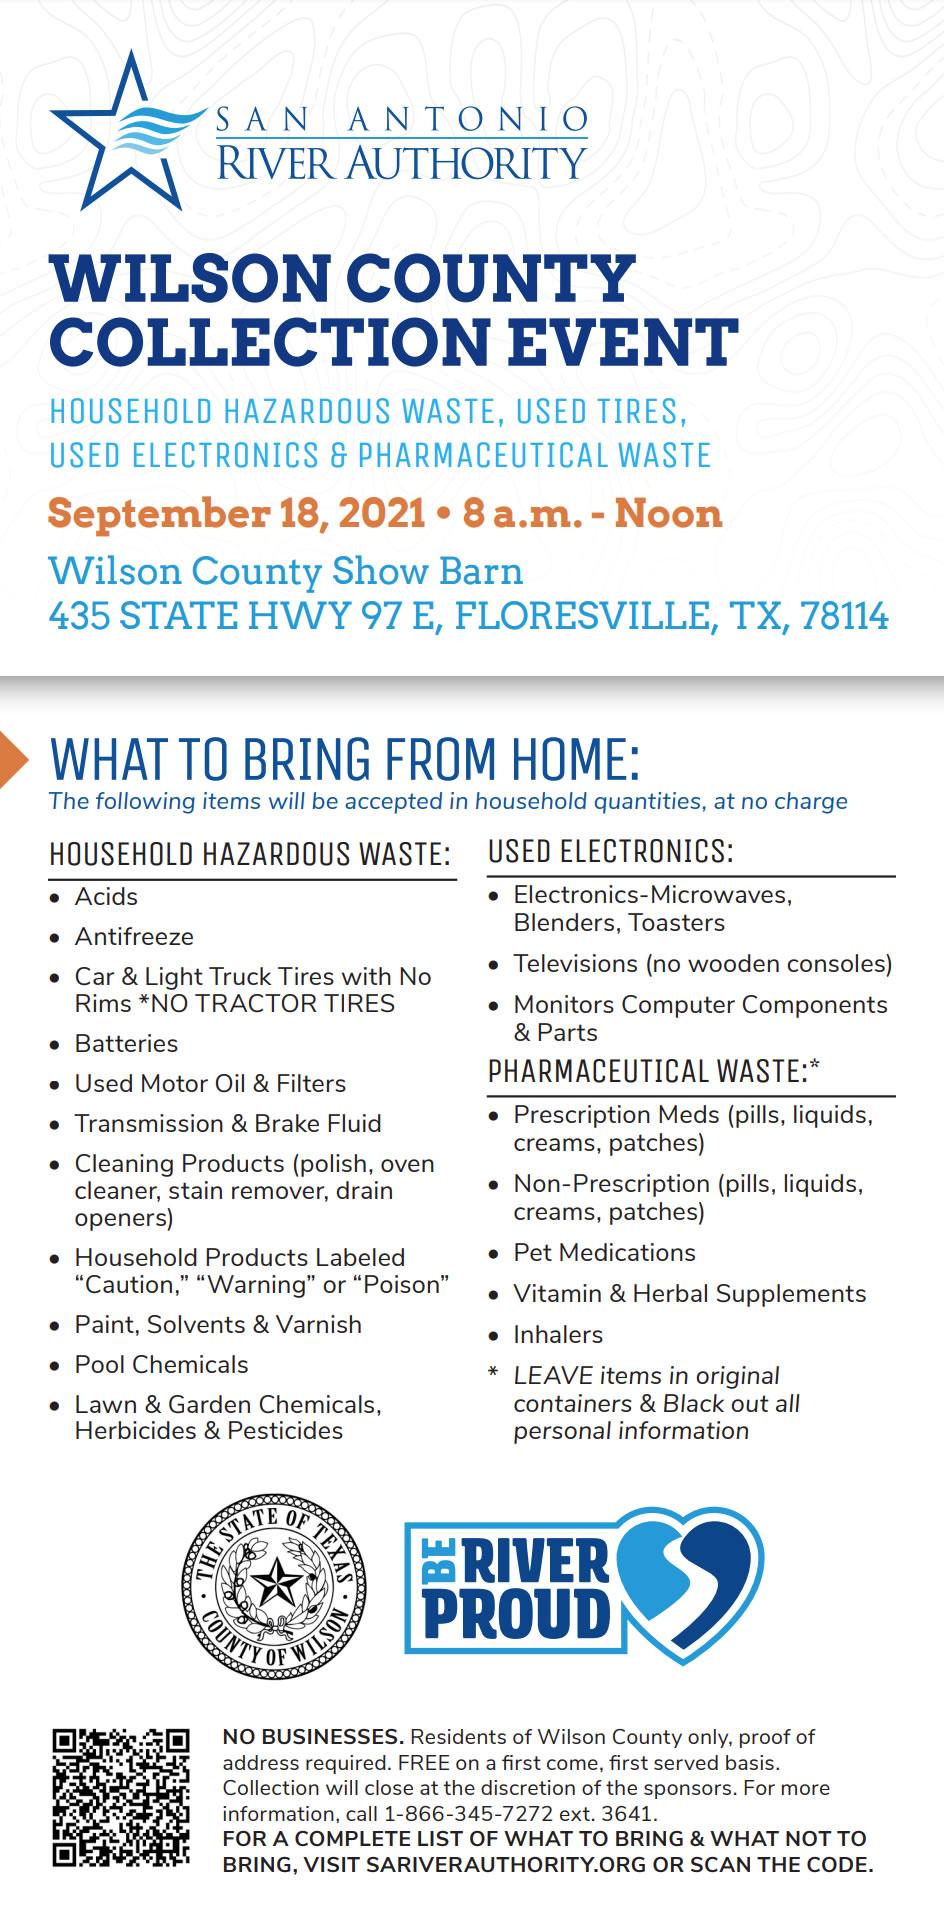 Wilson County Hazardous Waste Collection, September 18, 2021